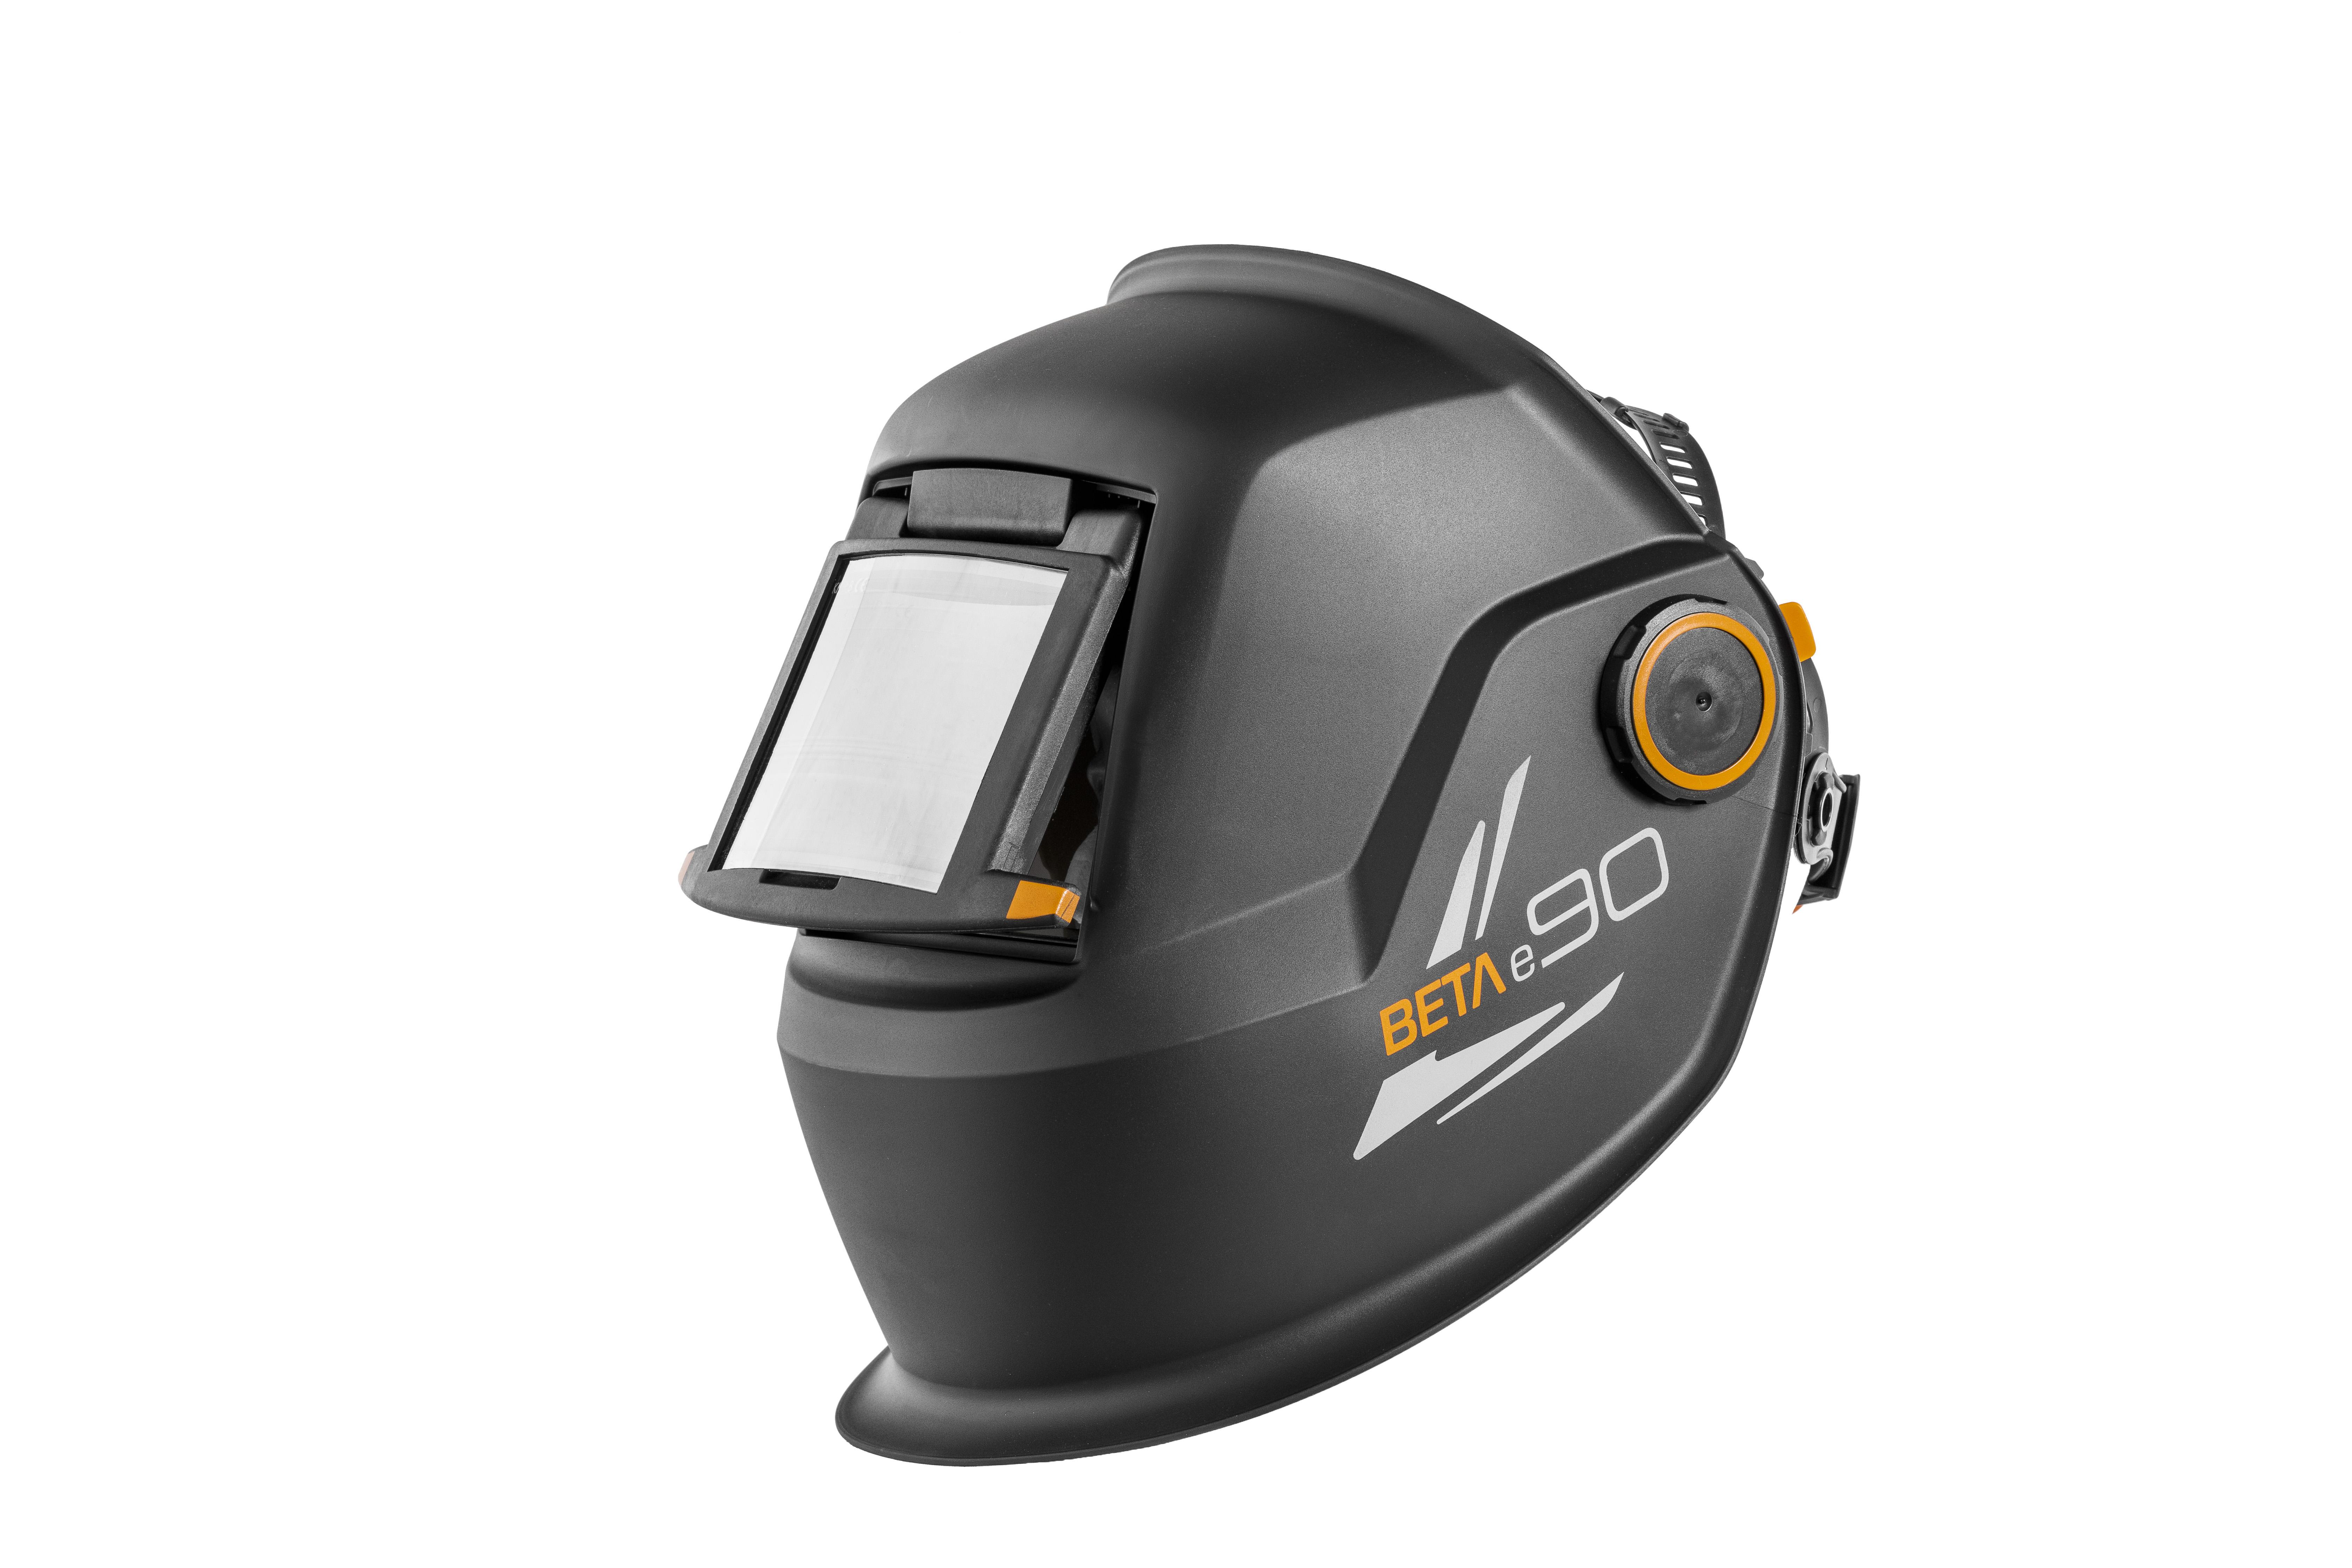 Сварочная маска Kemppi Beta e90p (9873022) сварочная маска kemppi beta e90p 9873022